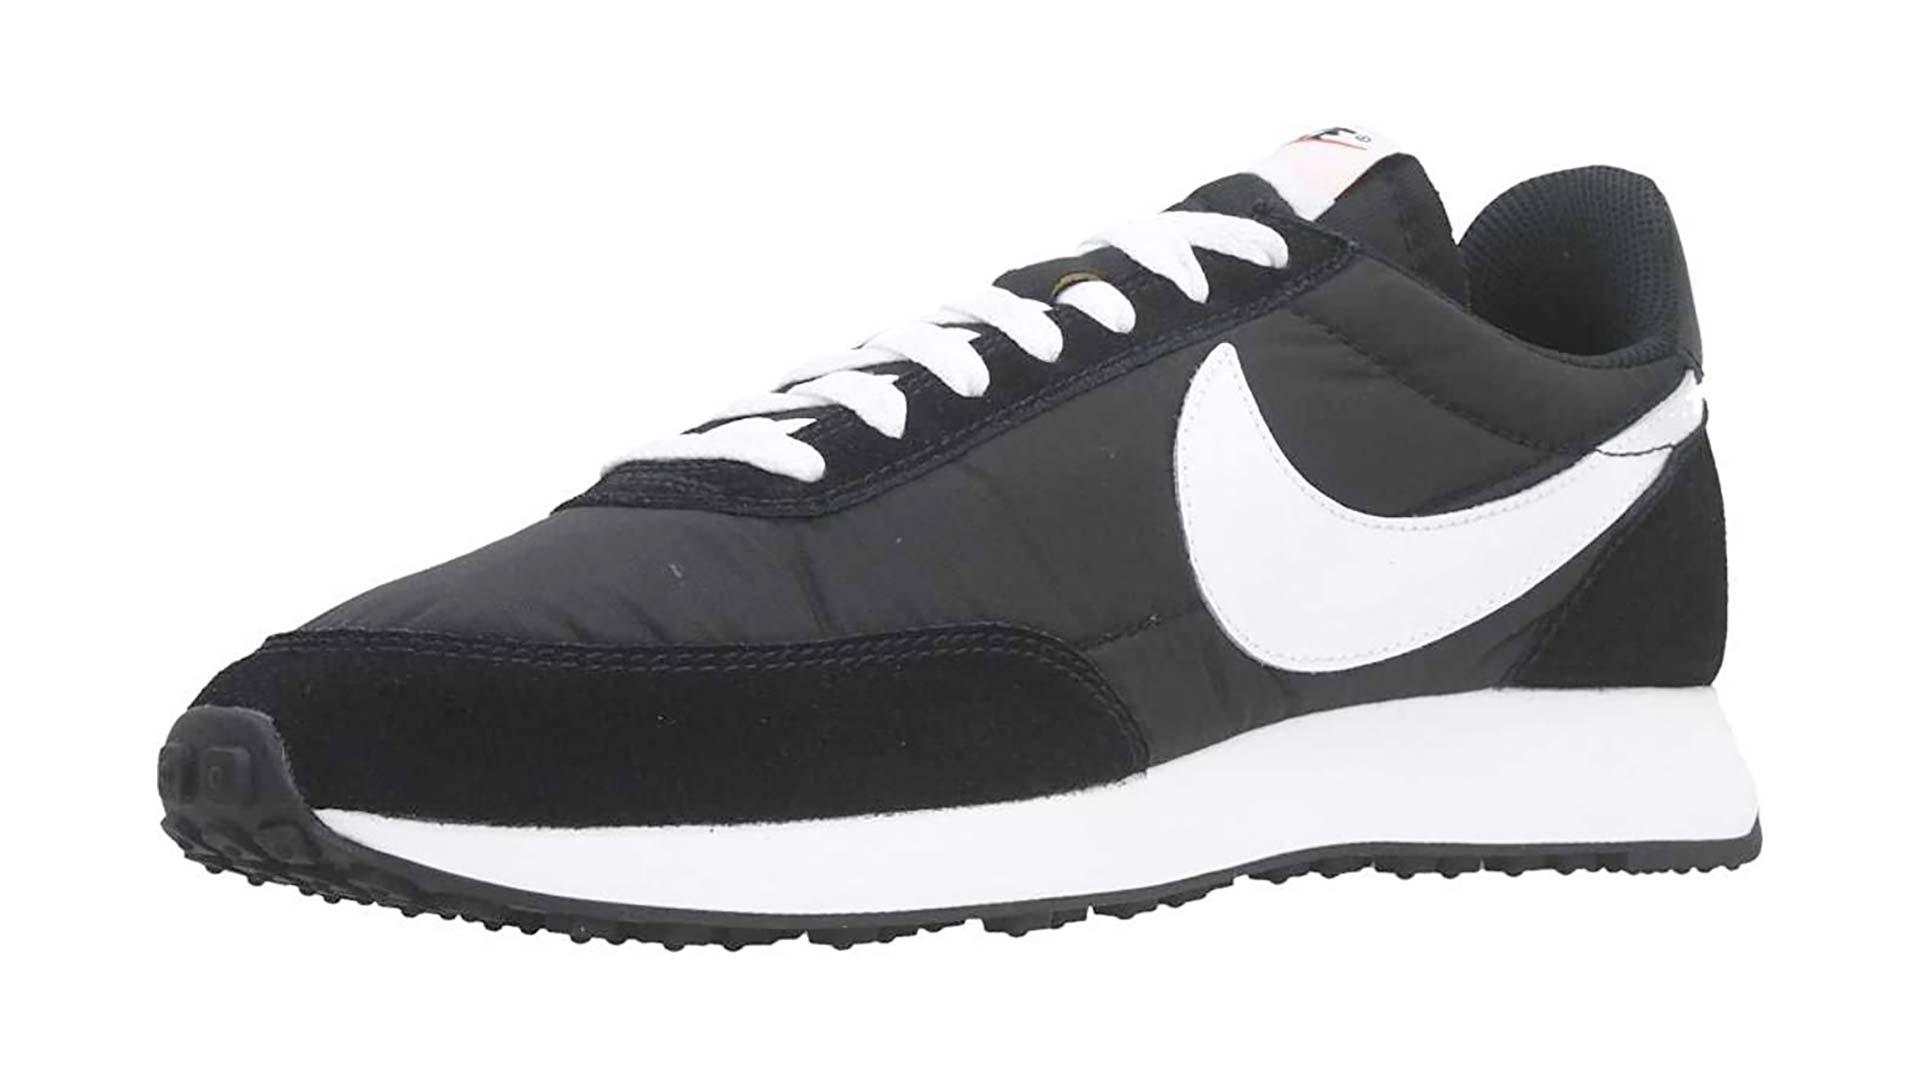 Best Nike trainers 2020: 10 fantastic